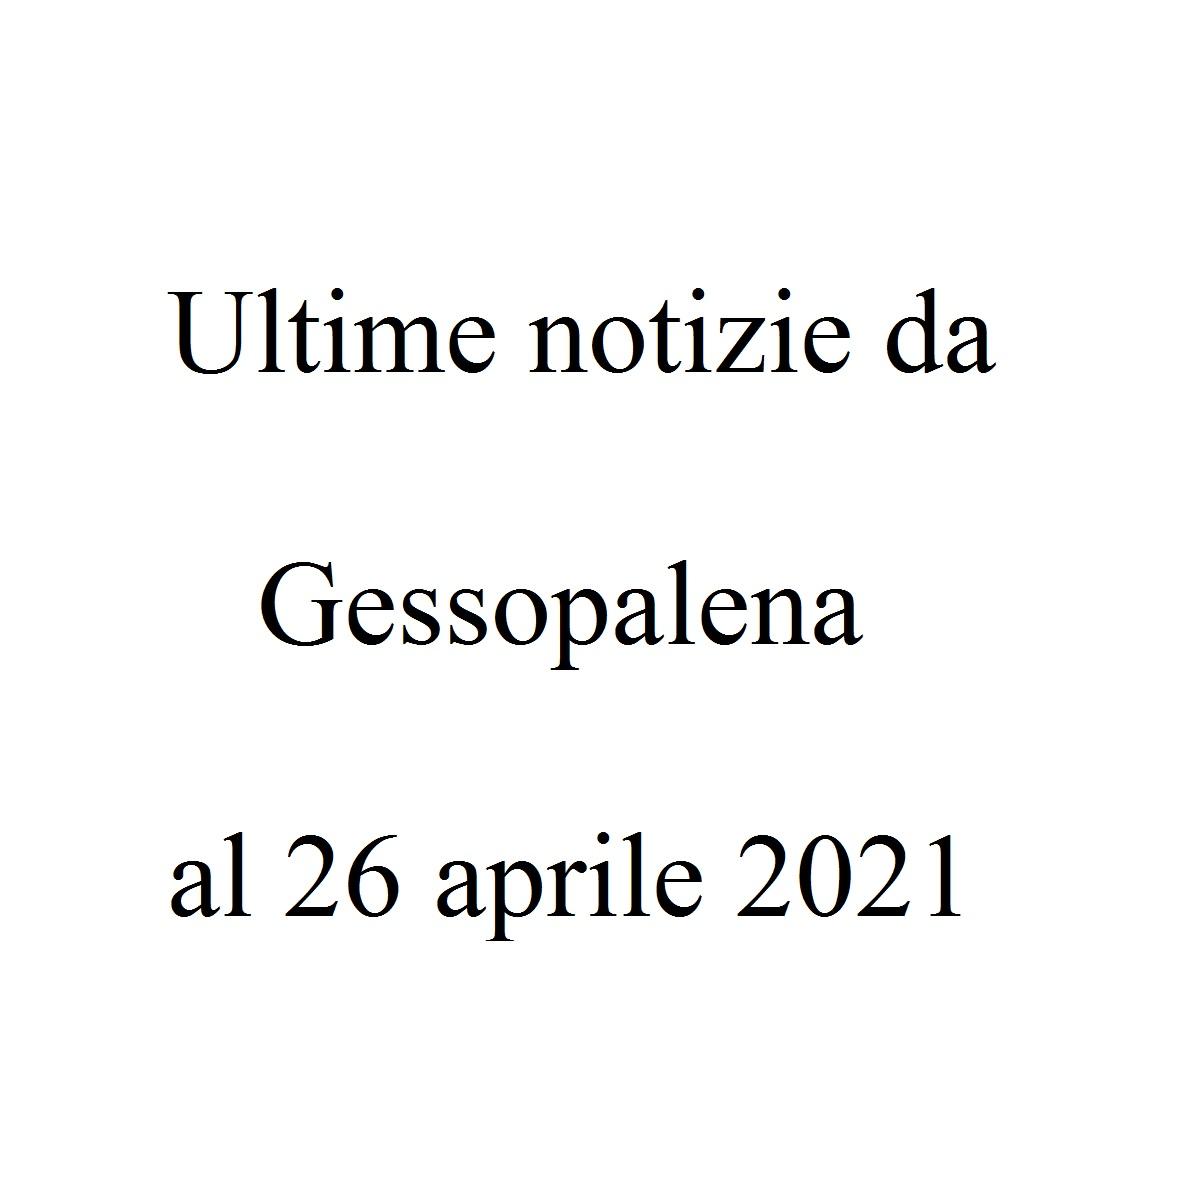 Ultime notizie da Gessopalena al 26 aprile 2021 foto